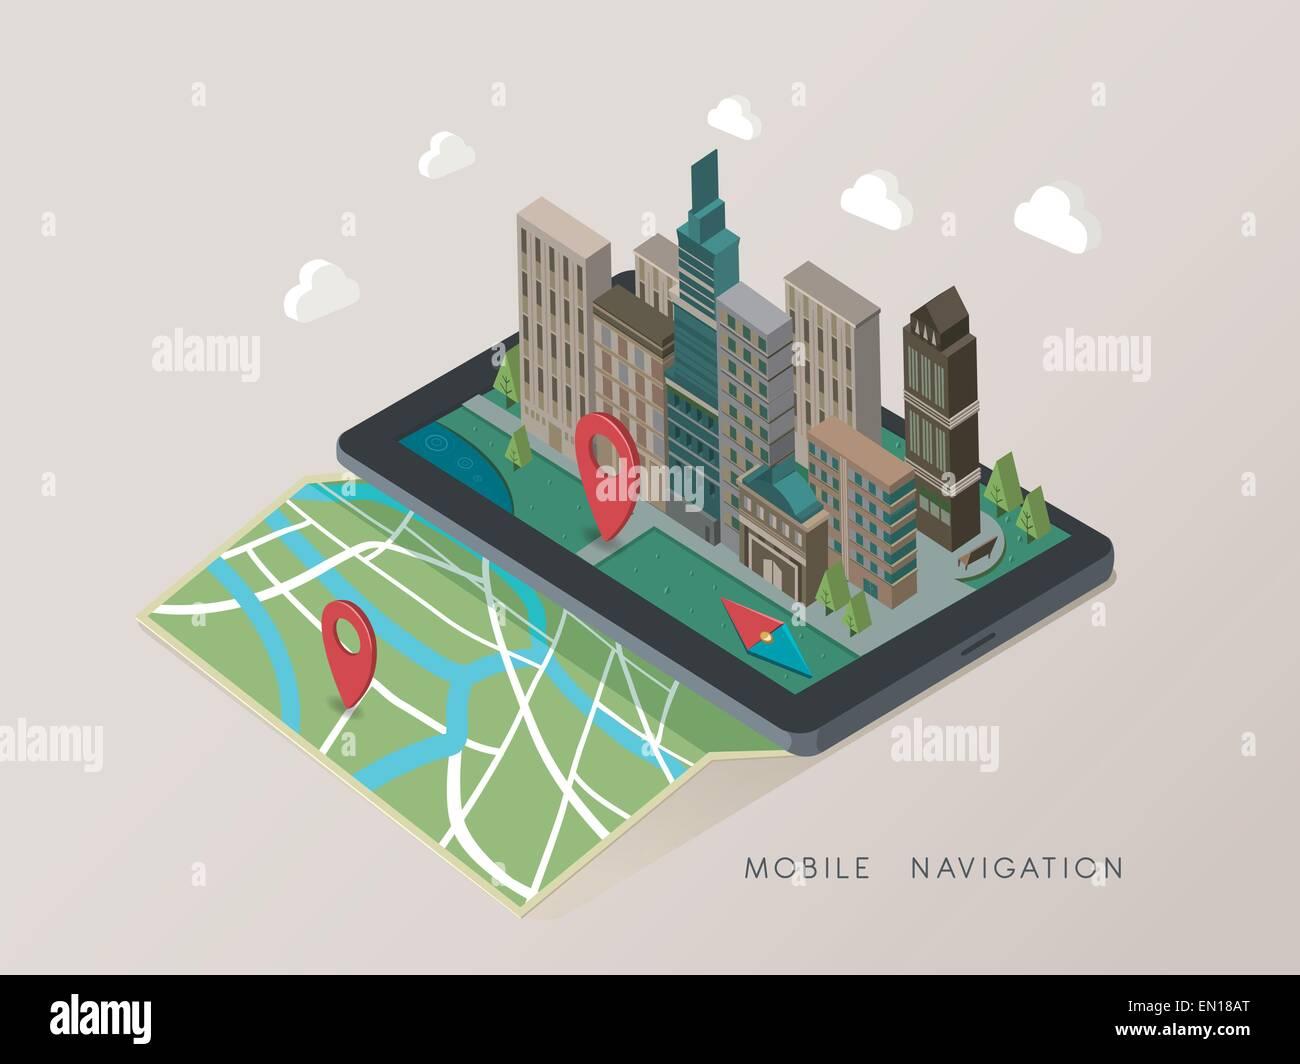 flat 3d isometric mobile navigation illustration over grey background - Stock Vector